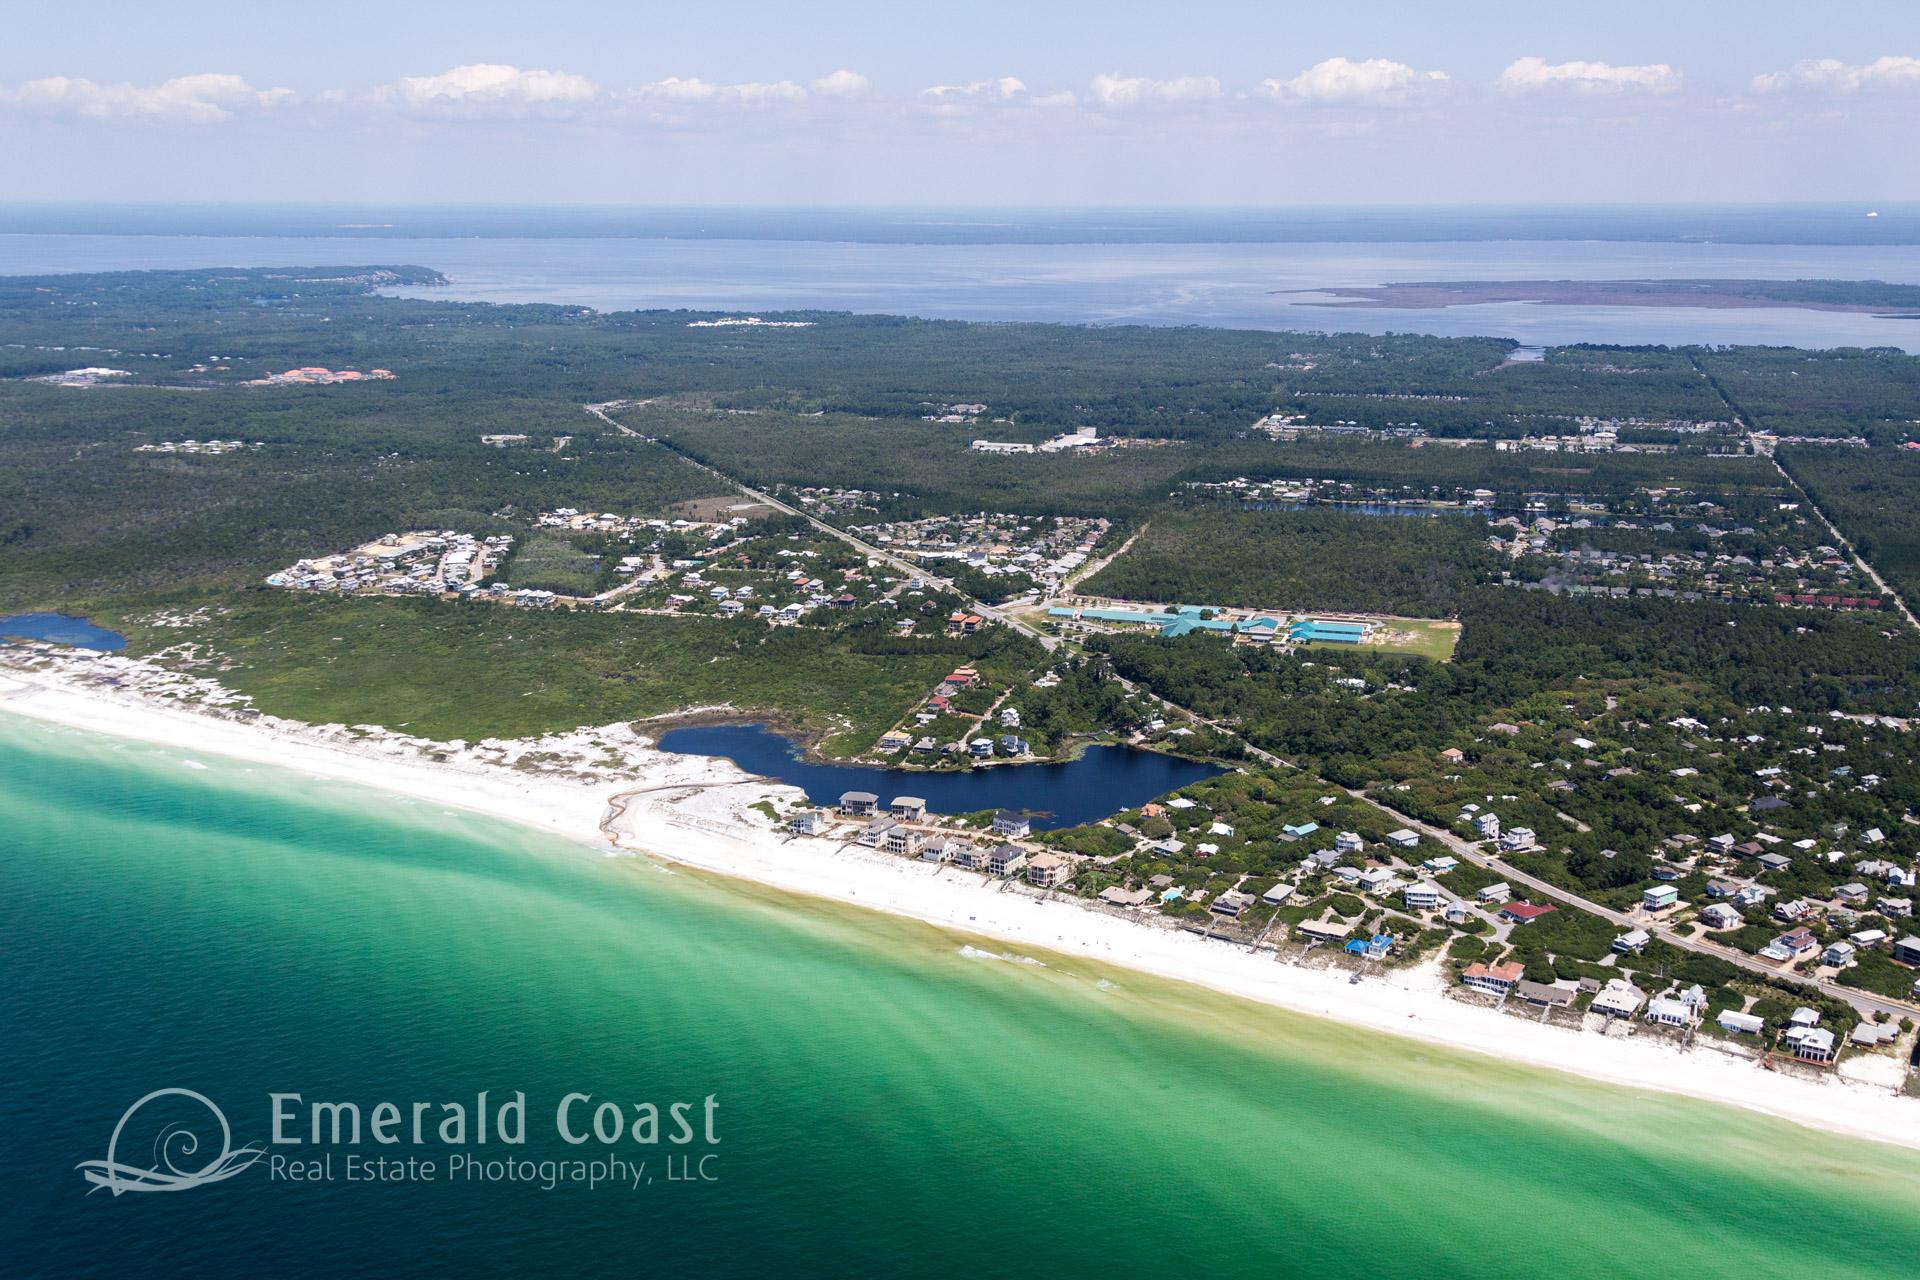 Aerial view of County Highway 30A, Santa Rosa Beach, Florida